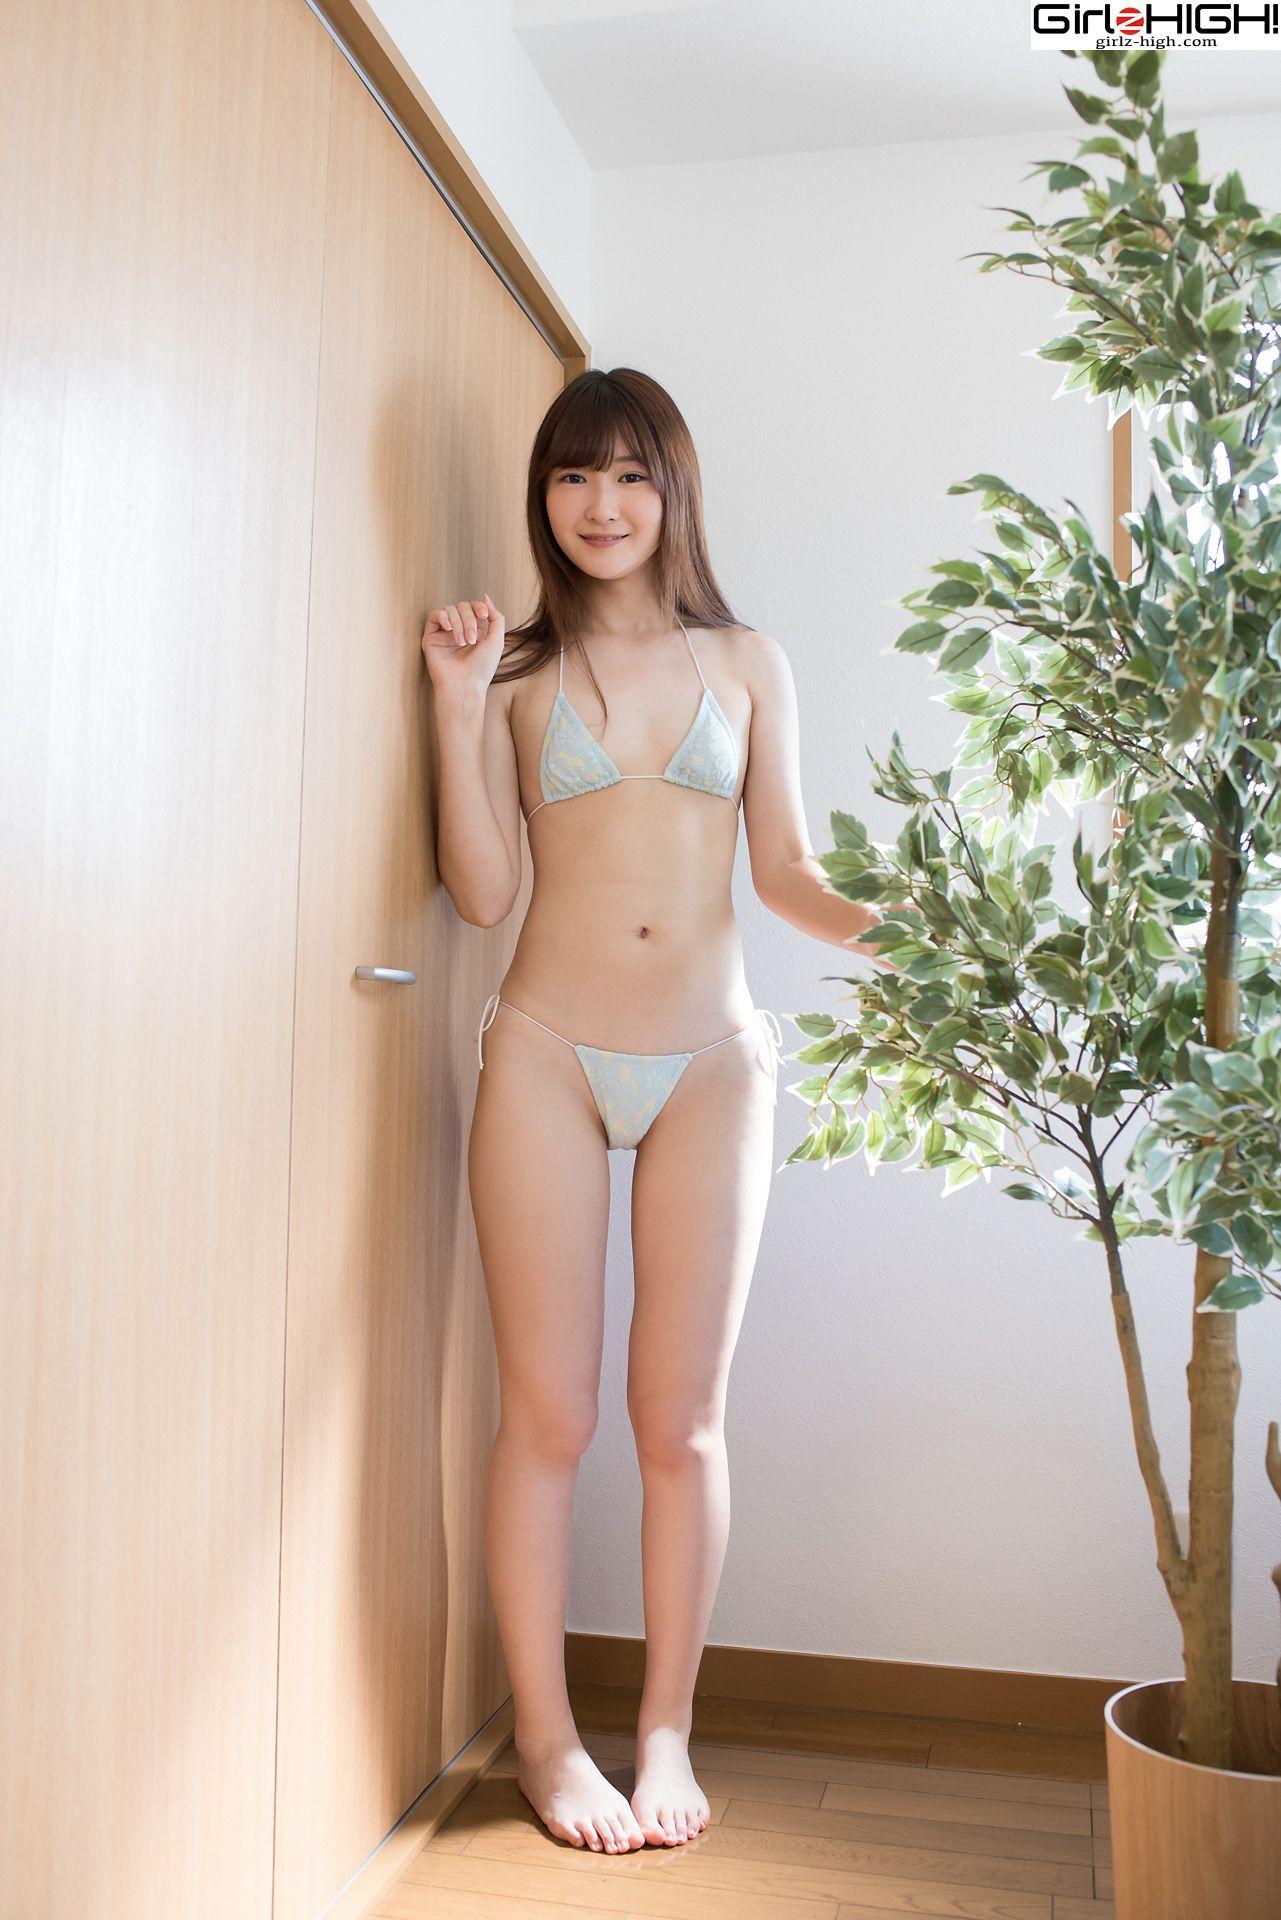 VOL.992 [Girlz-High]泳装性感少女:近藤麻美(近藤あさみ)超高清写真套图(66P)